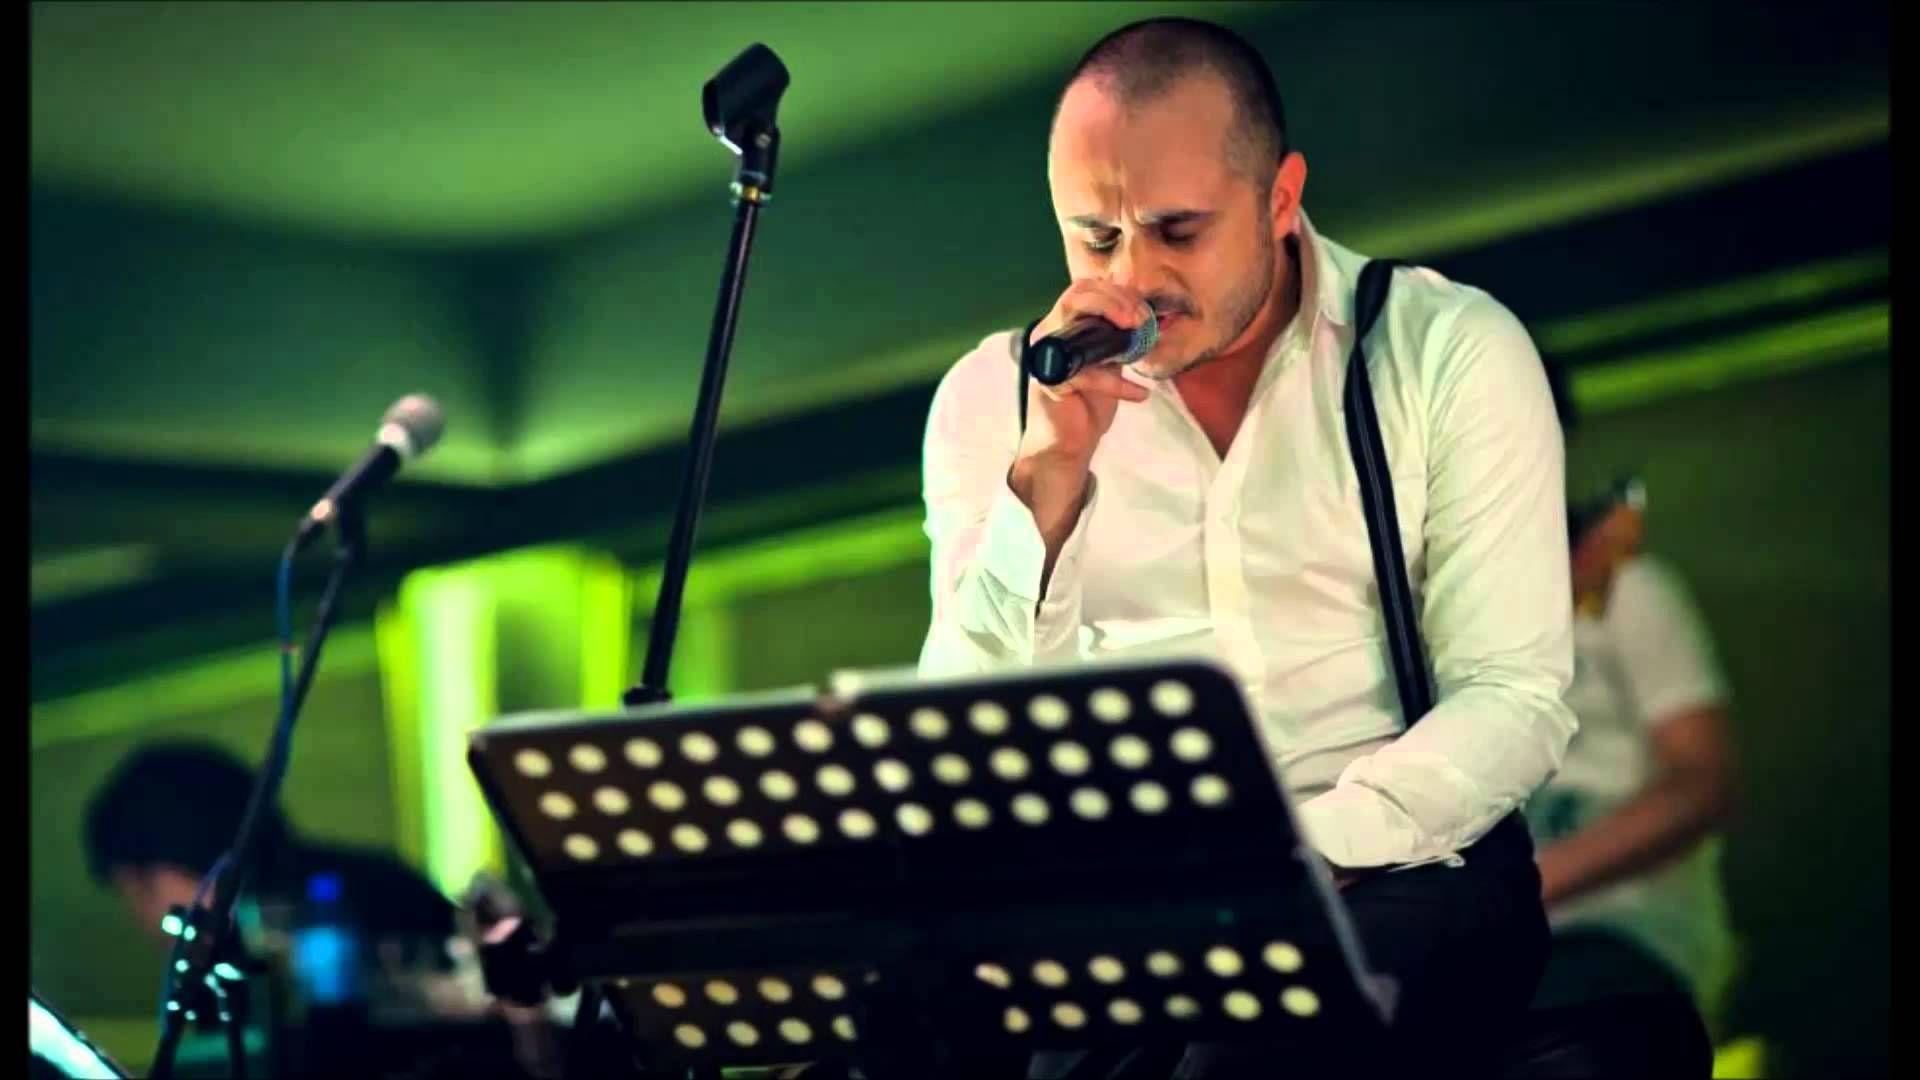 Men Azerbaycanli Moskvada Miri Yusif Men The Originals Youtube